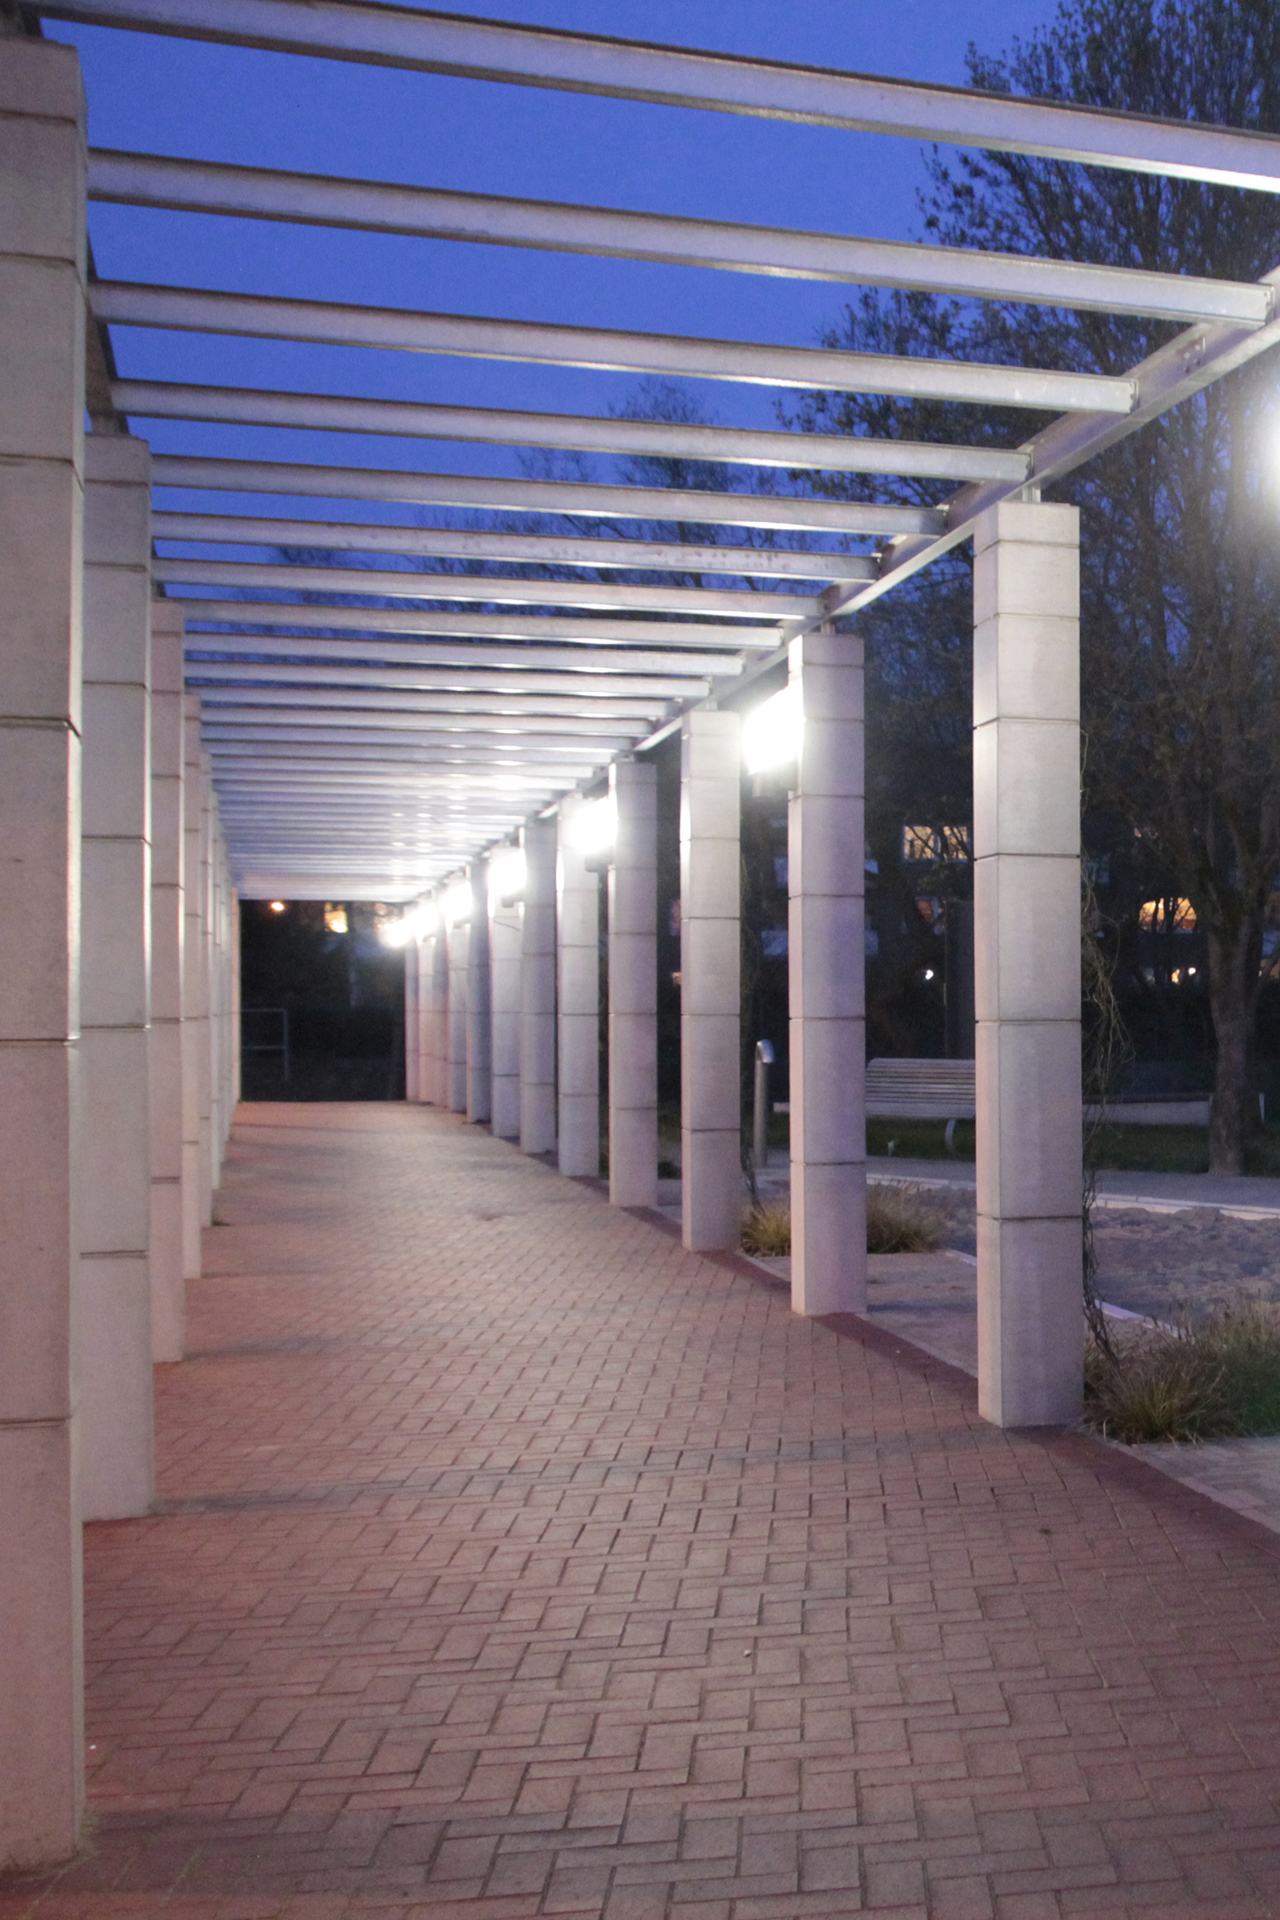 05 Leichlingen - Illumination Pergolaweg